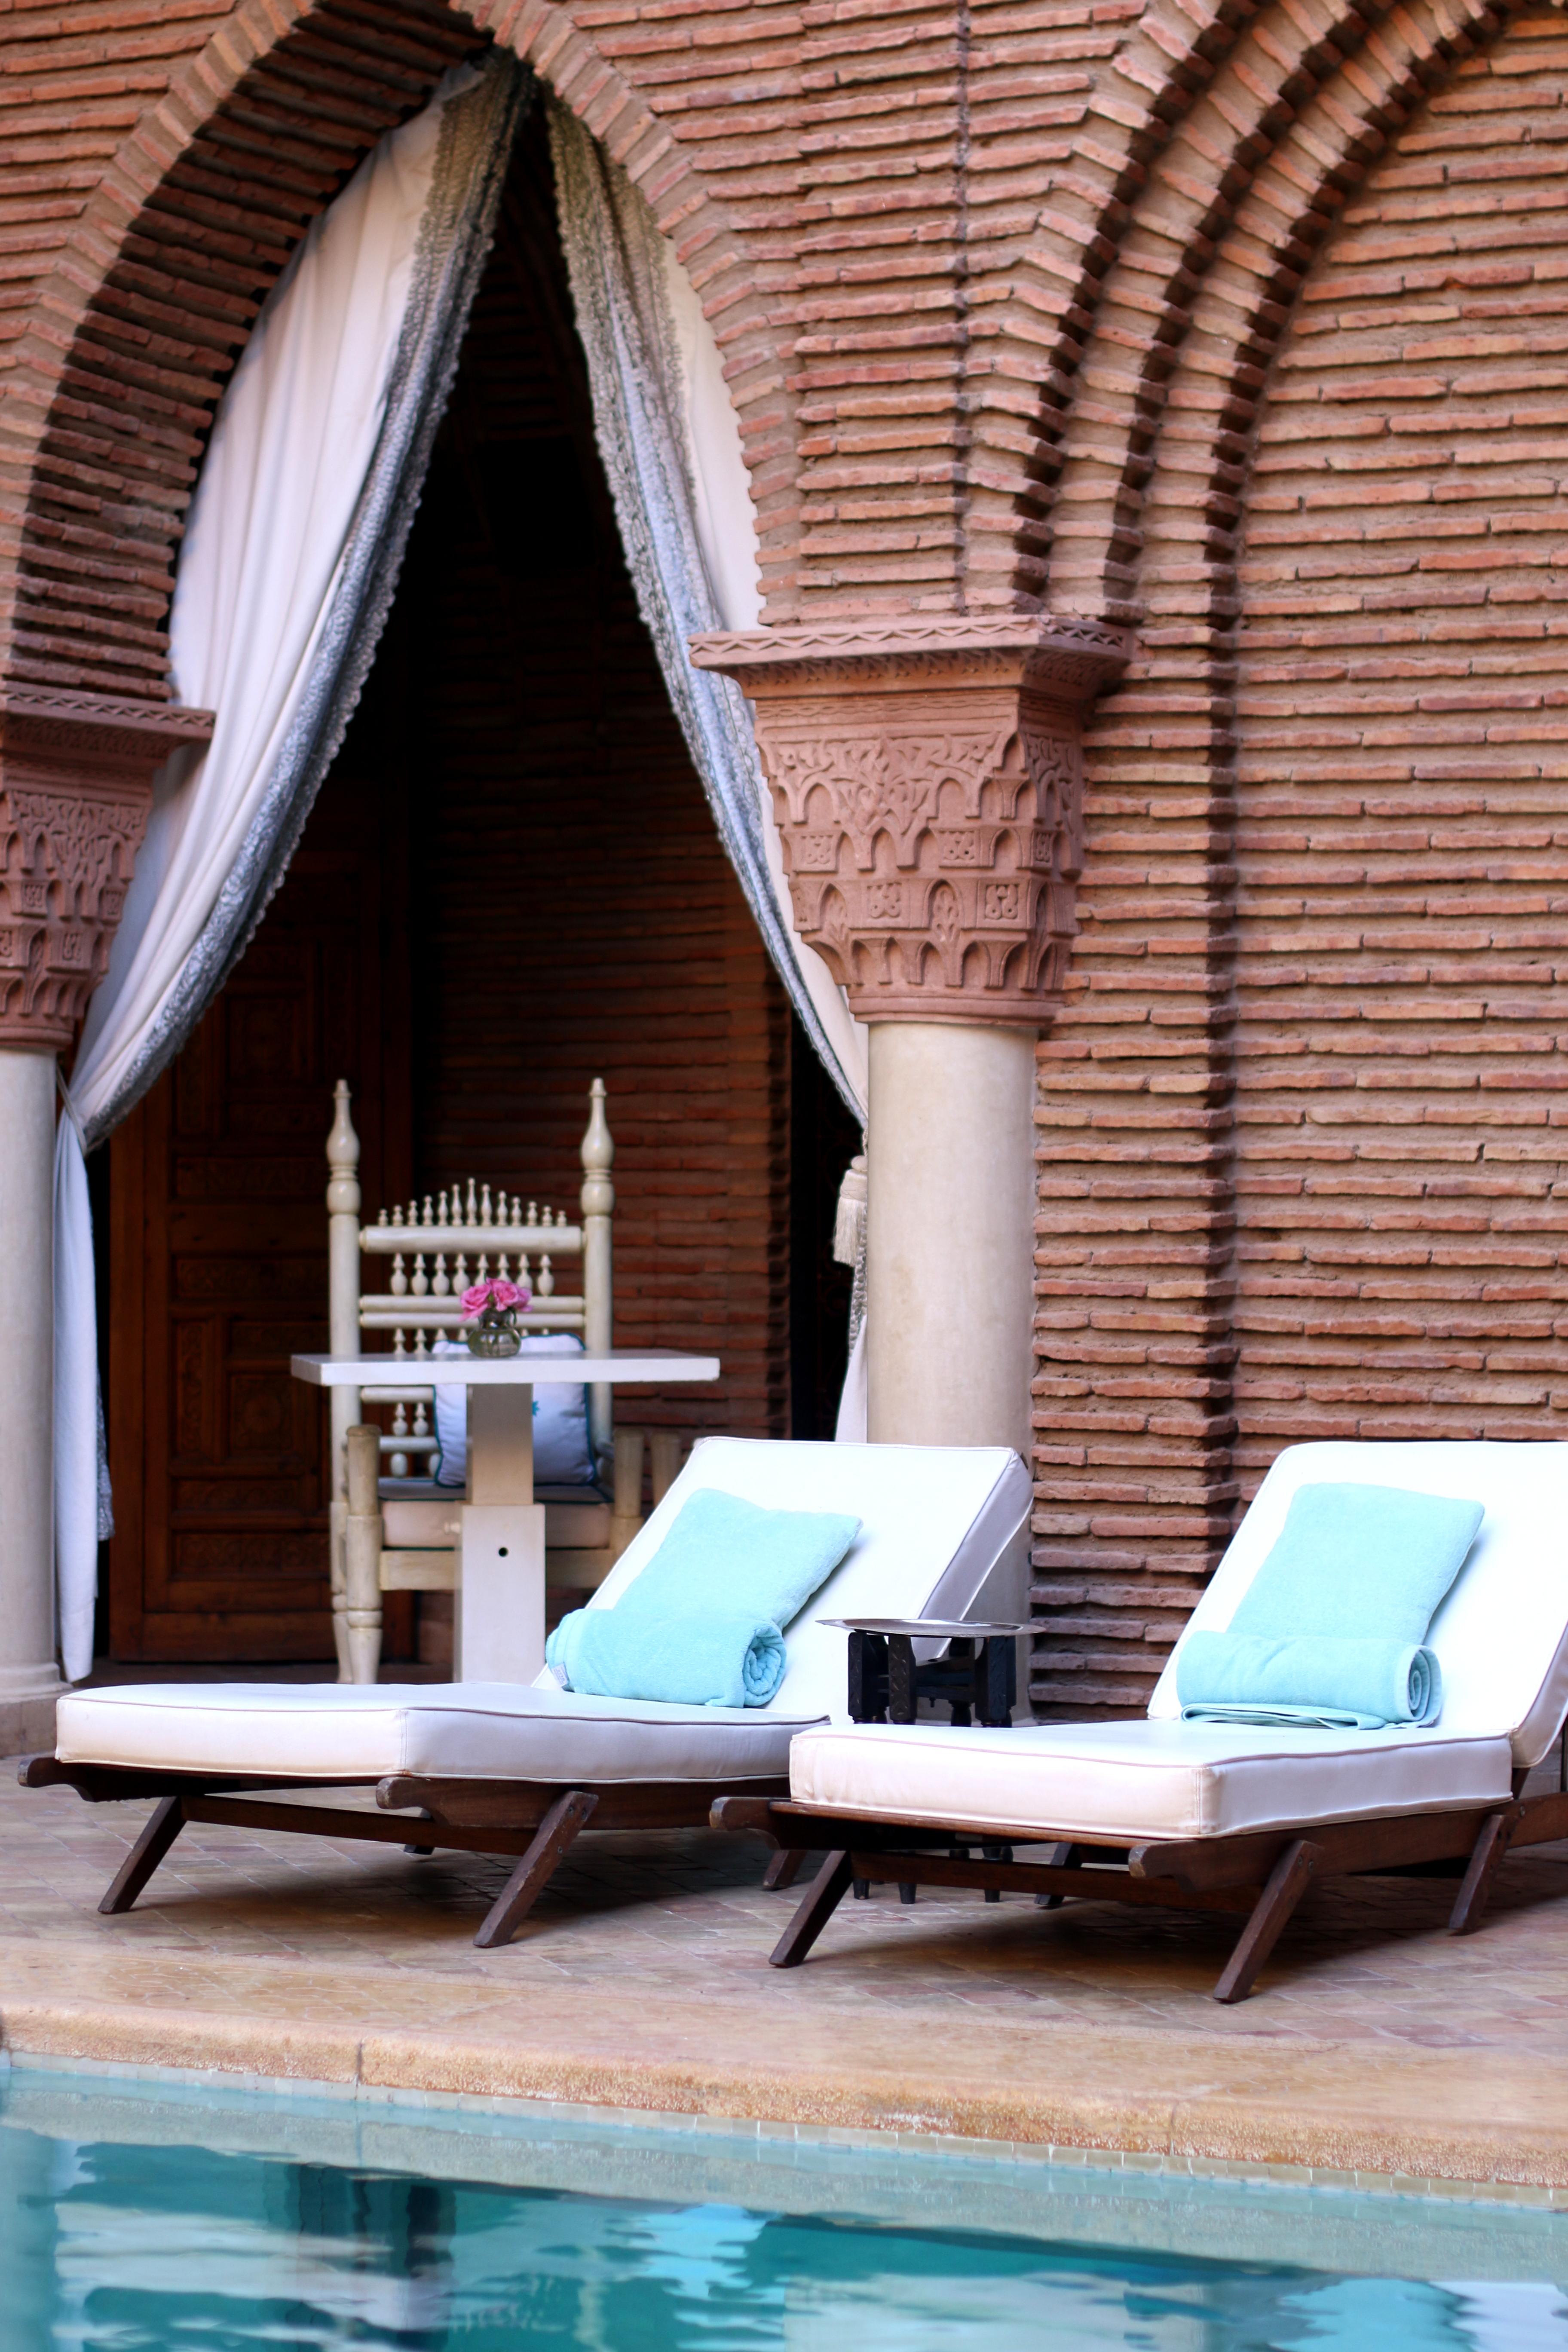 la sultana marrakech travel blog hotel guide hotel review travelblogger reiseblog hotel erfahrung